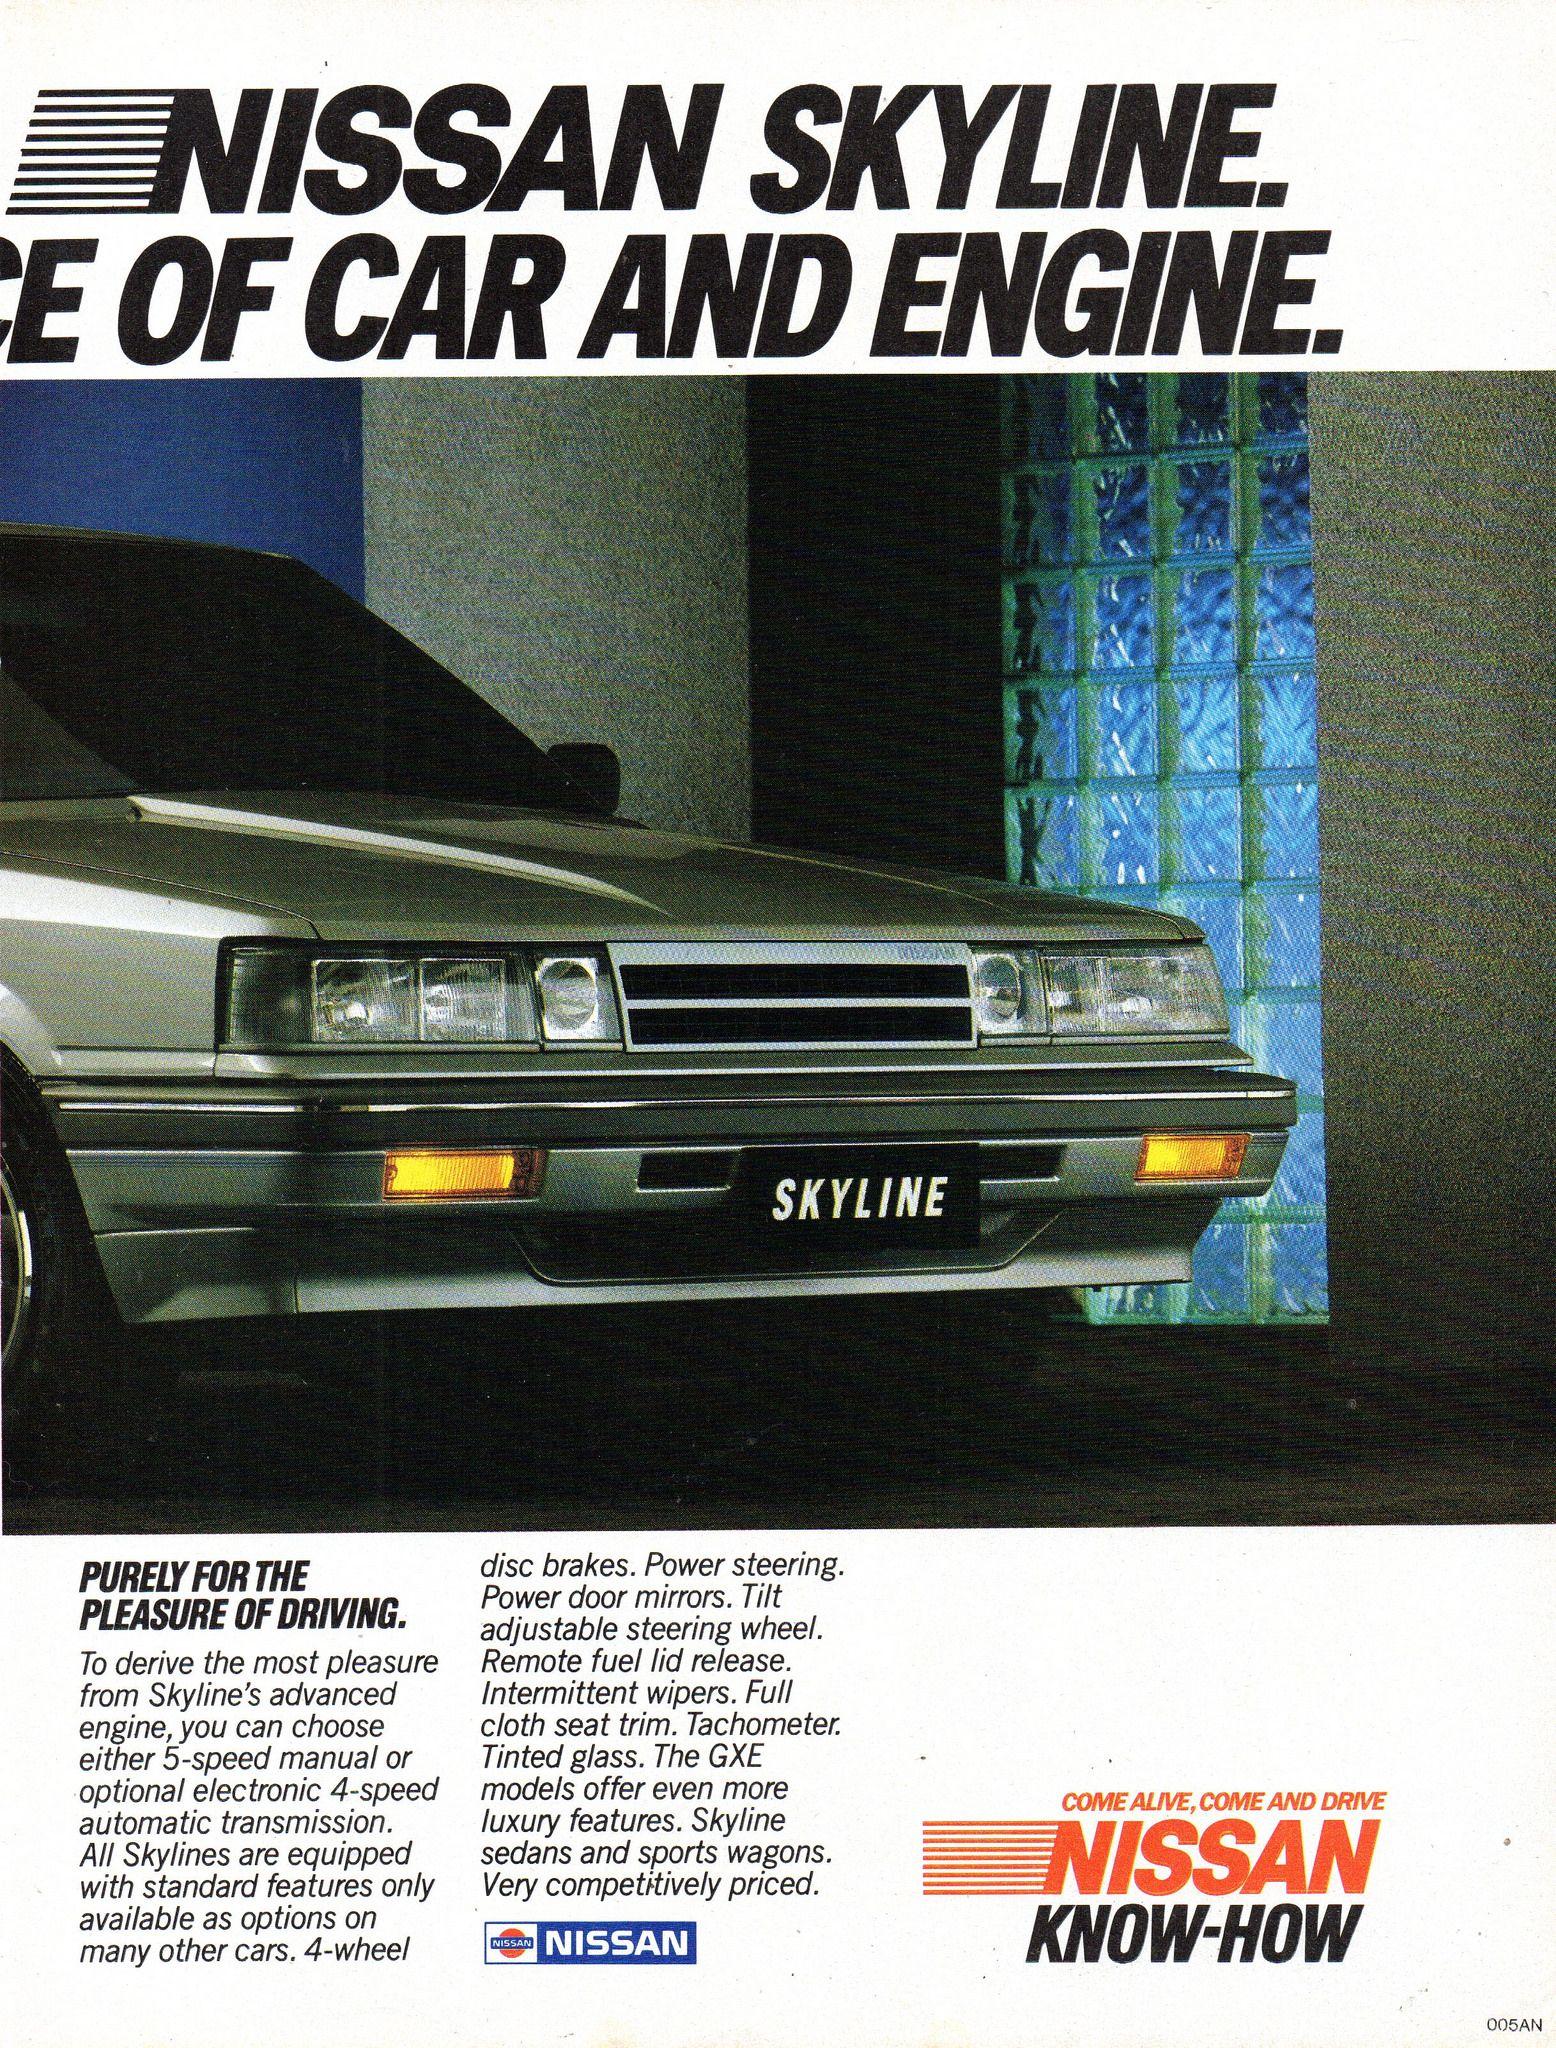 1986 Nissan Skyline Gxe Sedan R31 Page 2 Aussie Original Magazine Advertisement Nissan Skyline Nissan Nissan Cars